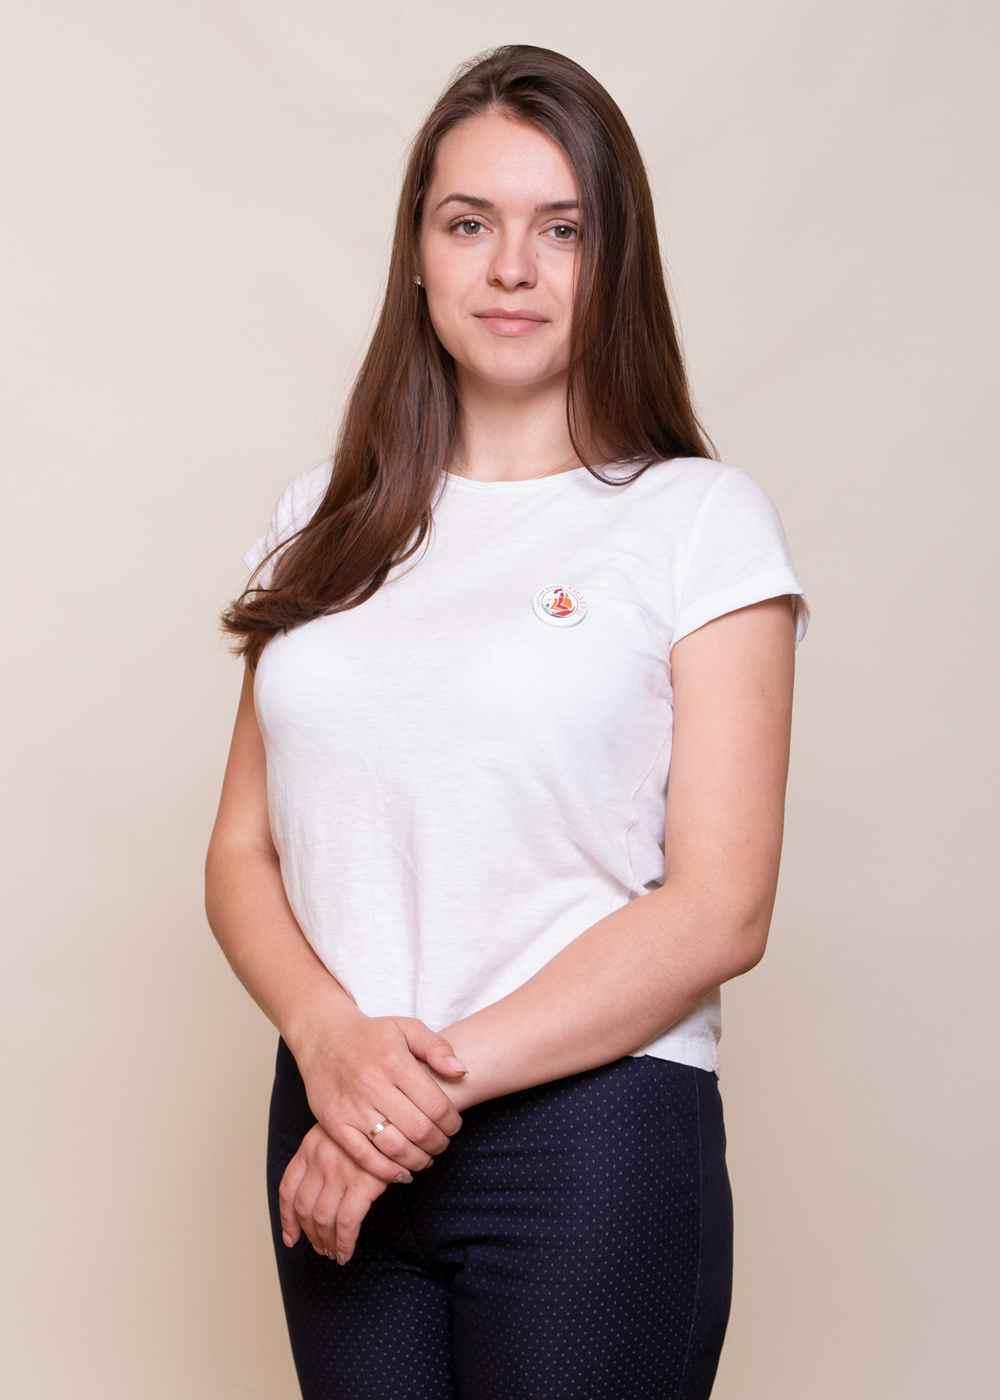 Гурвич Мария Александровна